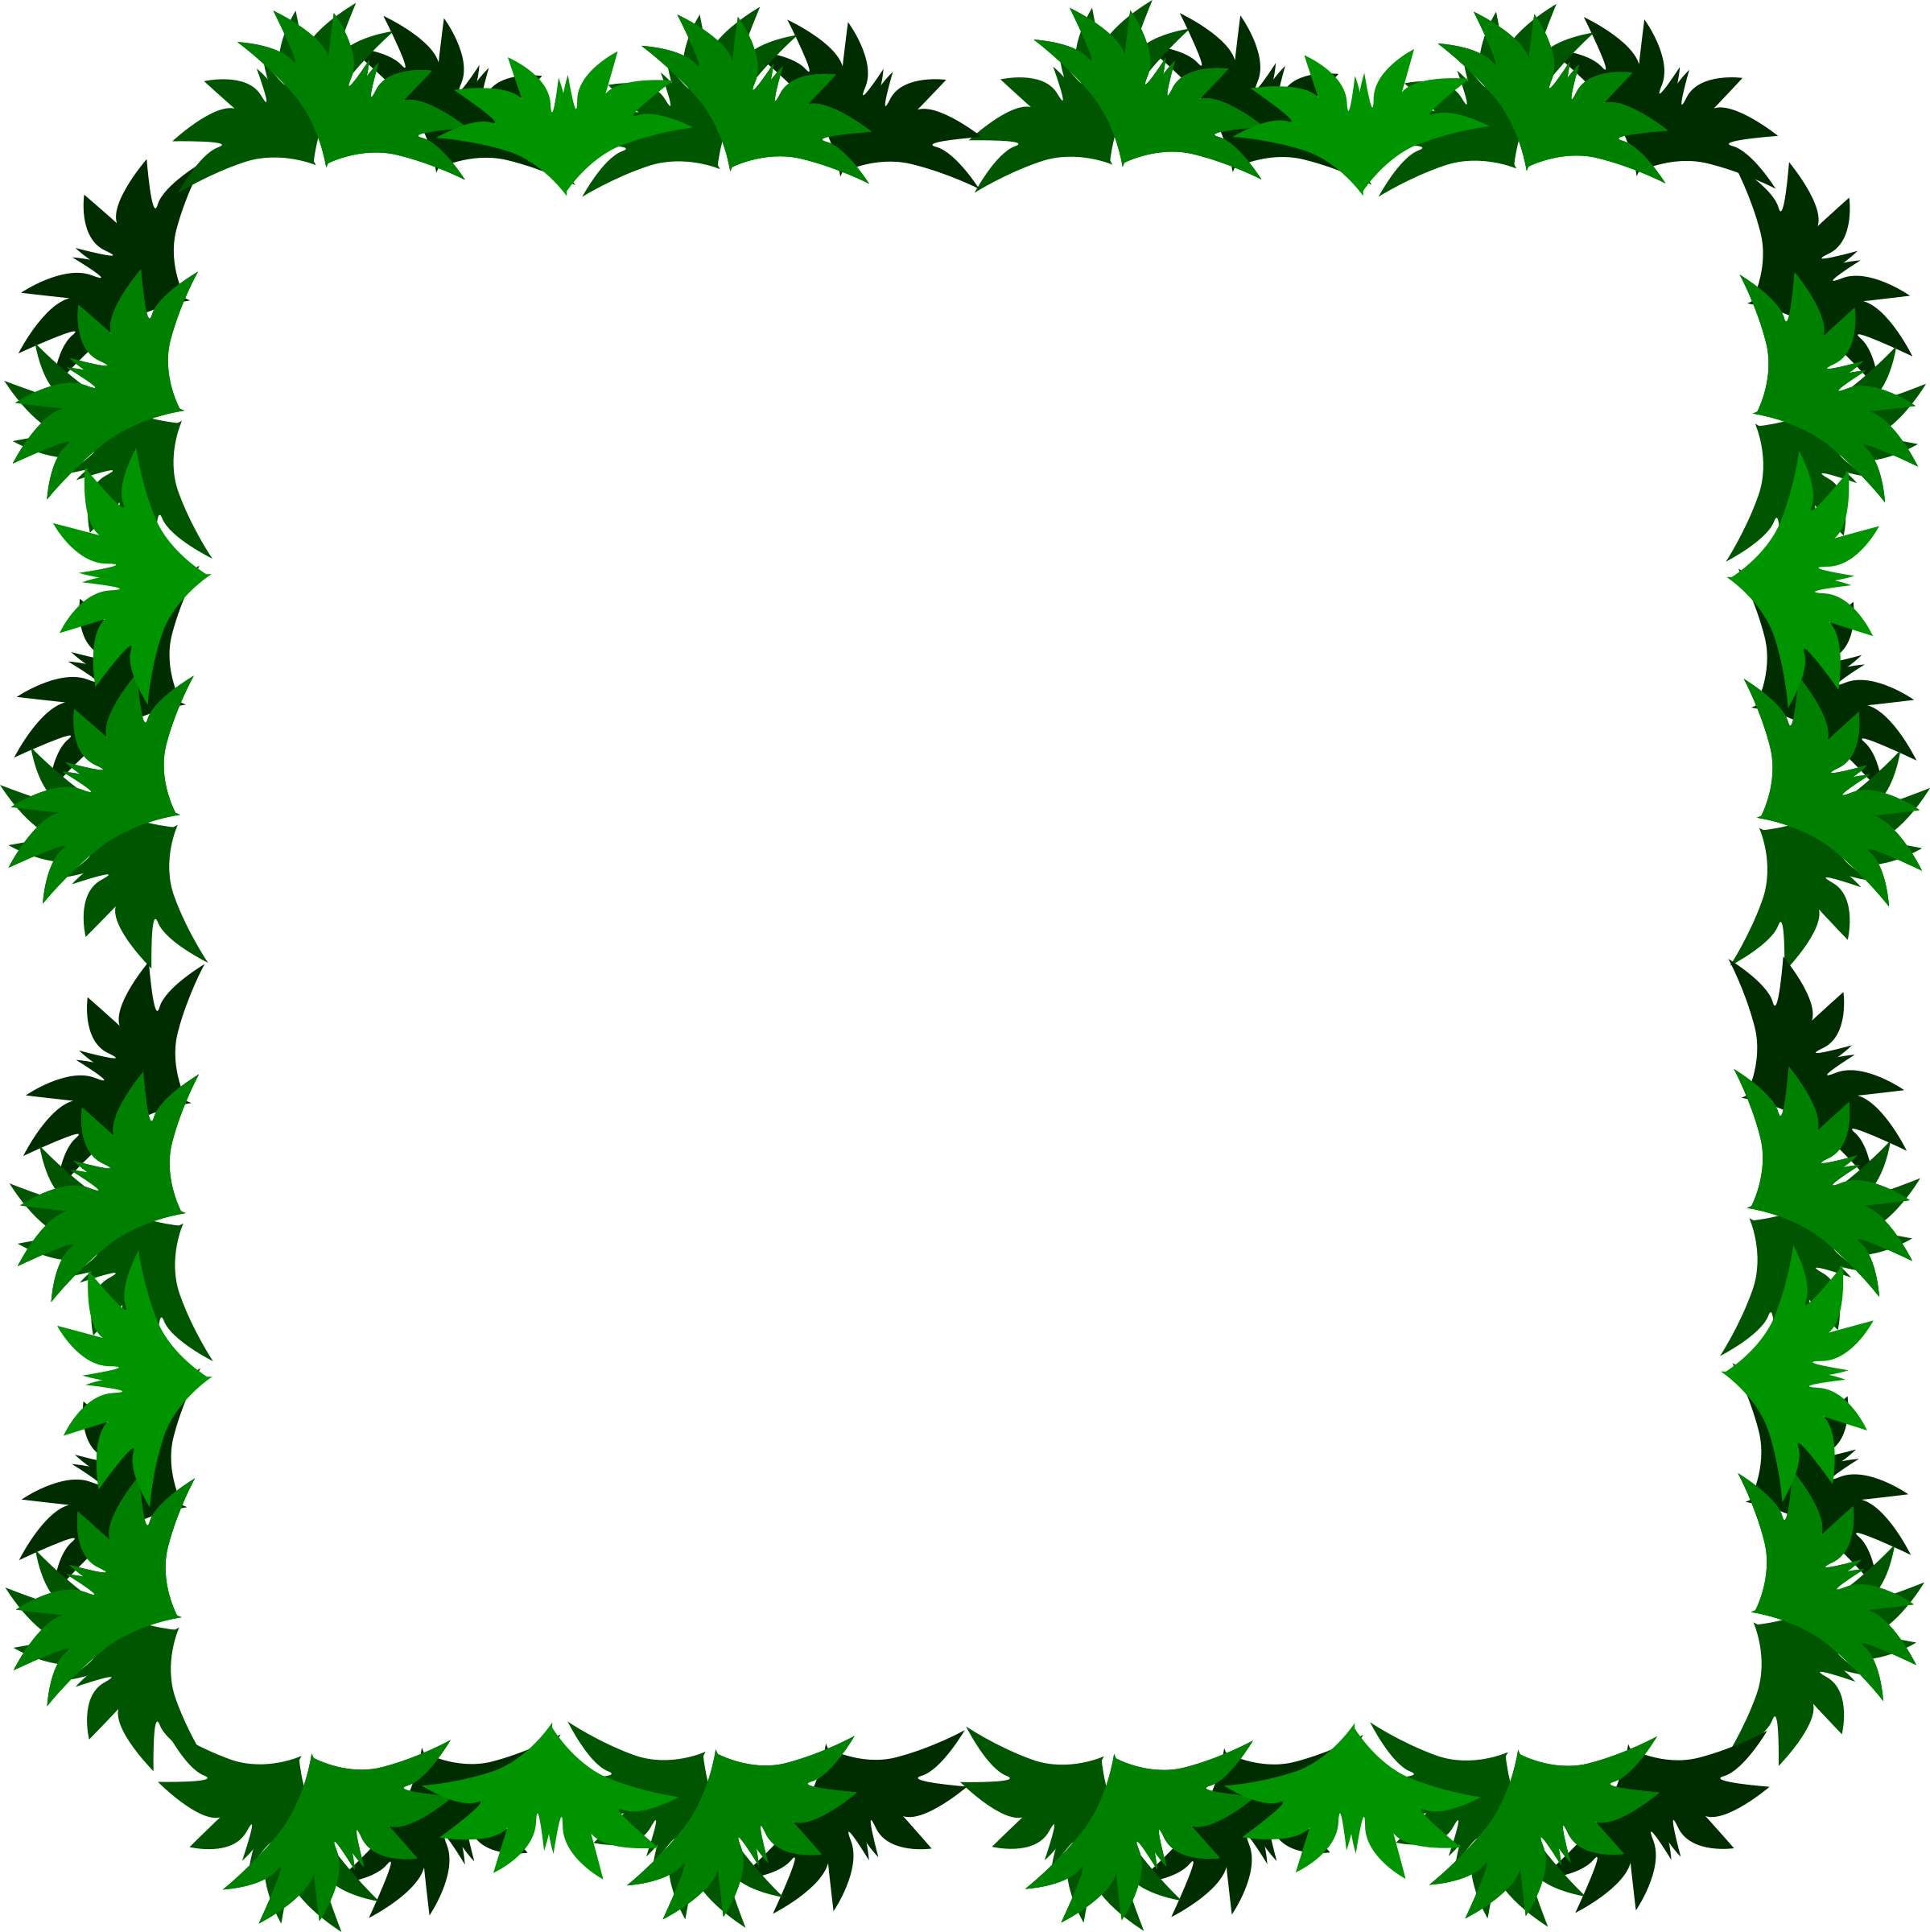 2398x2400 Sea Grass Clipart Grass Border